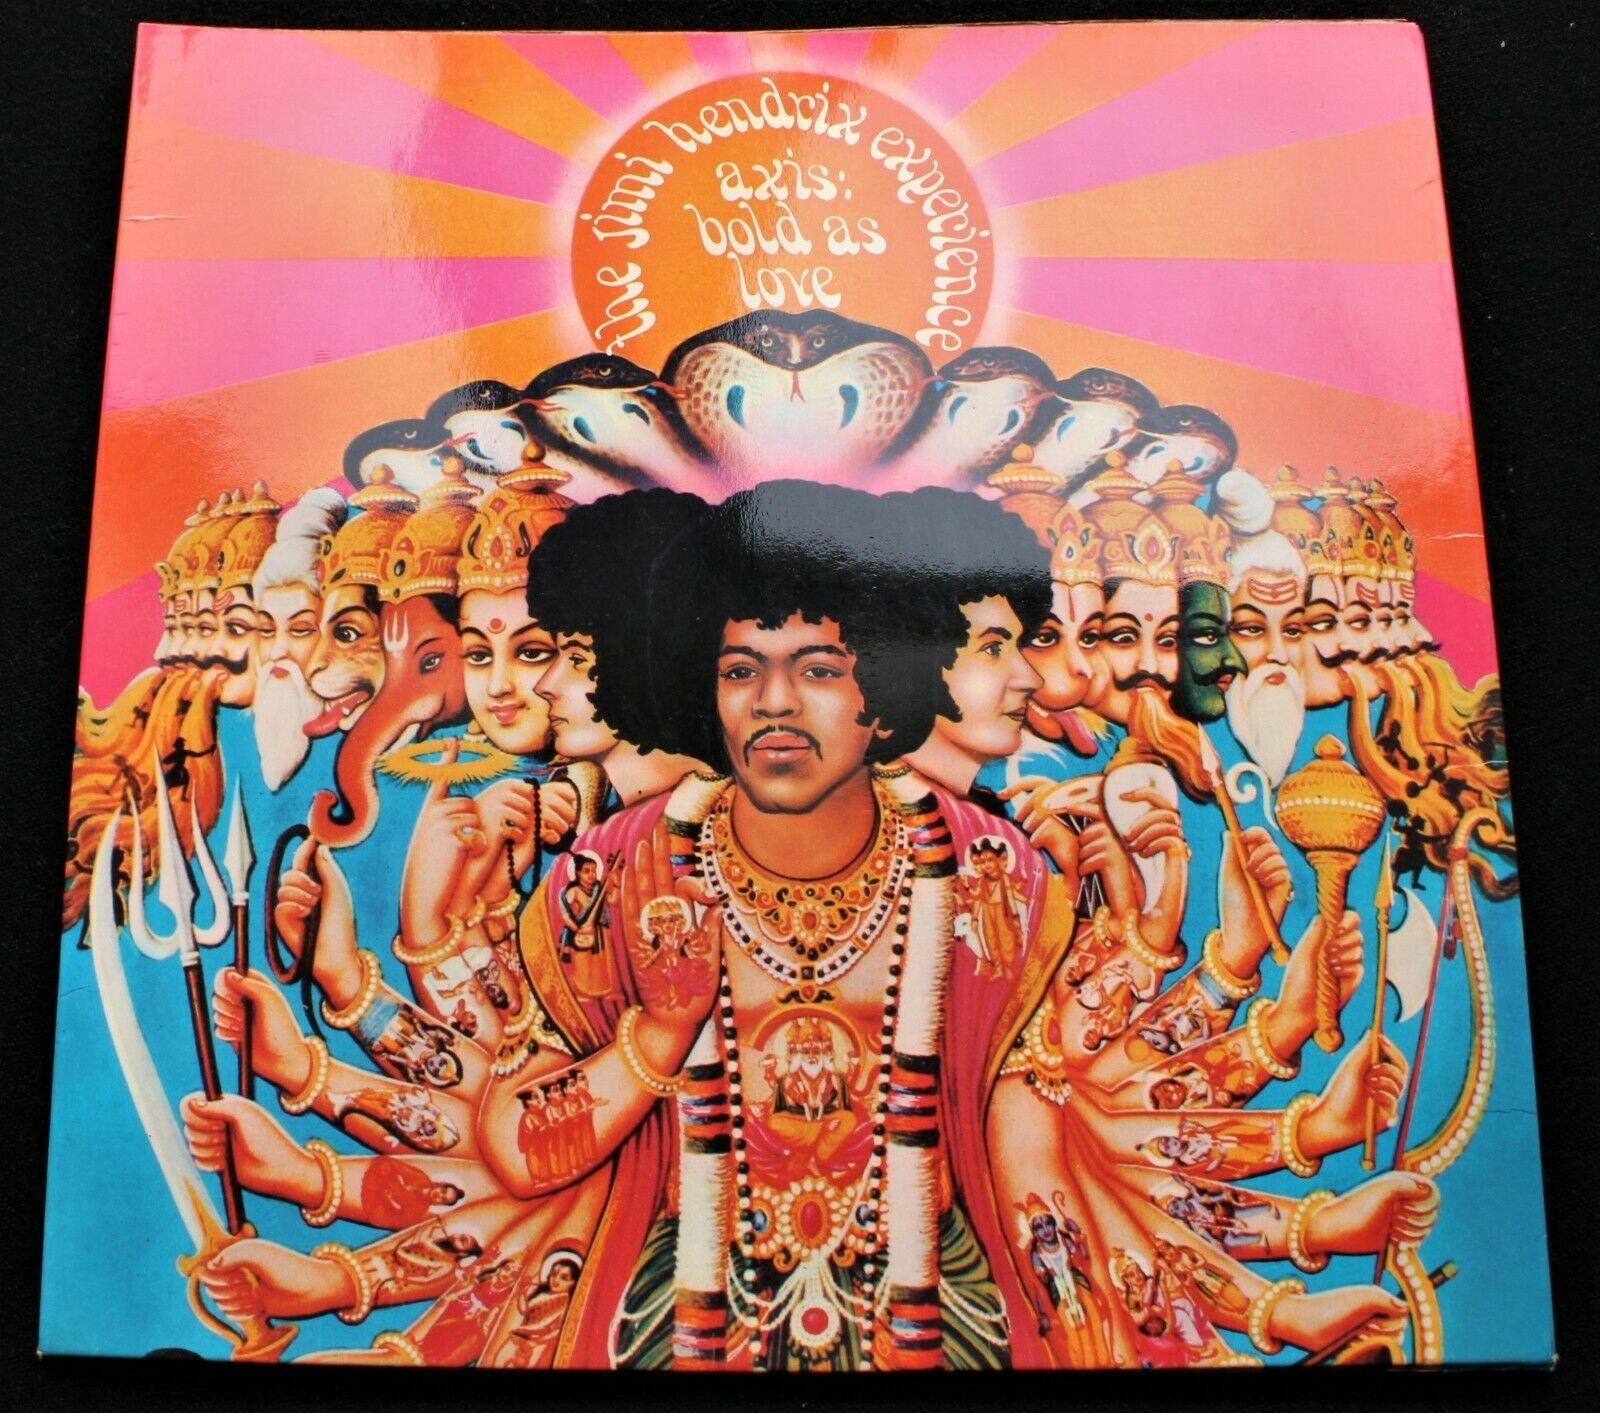 JIMI HENDRIX Axis Bold As Love UK 1967 MONO 1st pressing  MINT   Psych LP INSERT